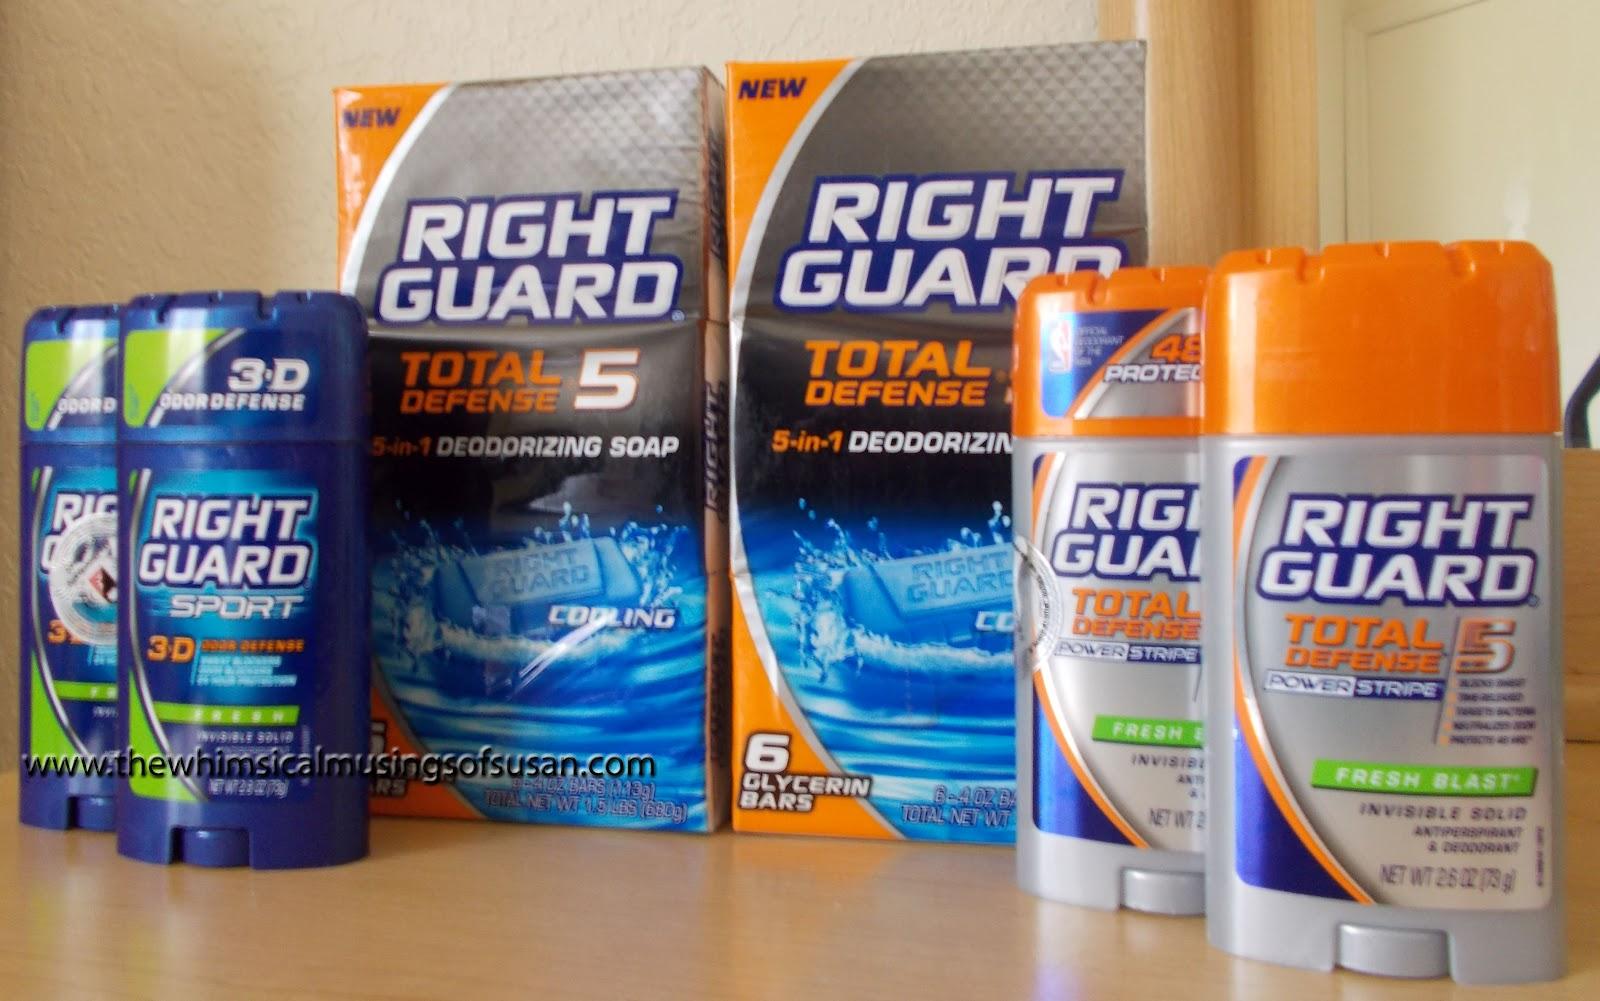 Cvs Haul Right Guard Products